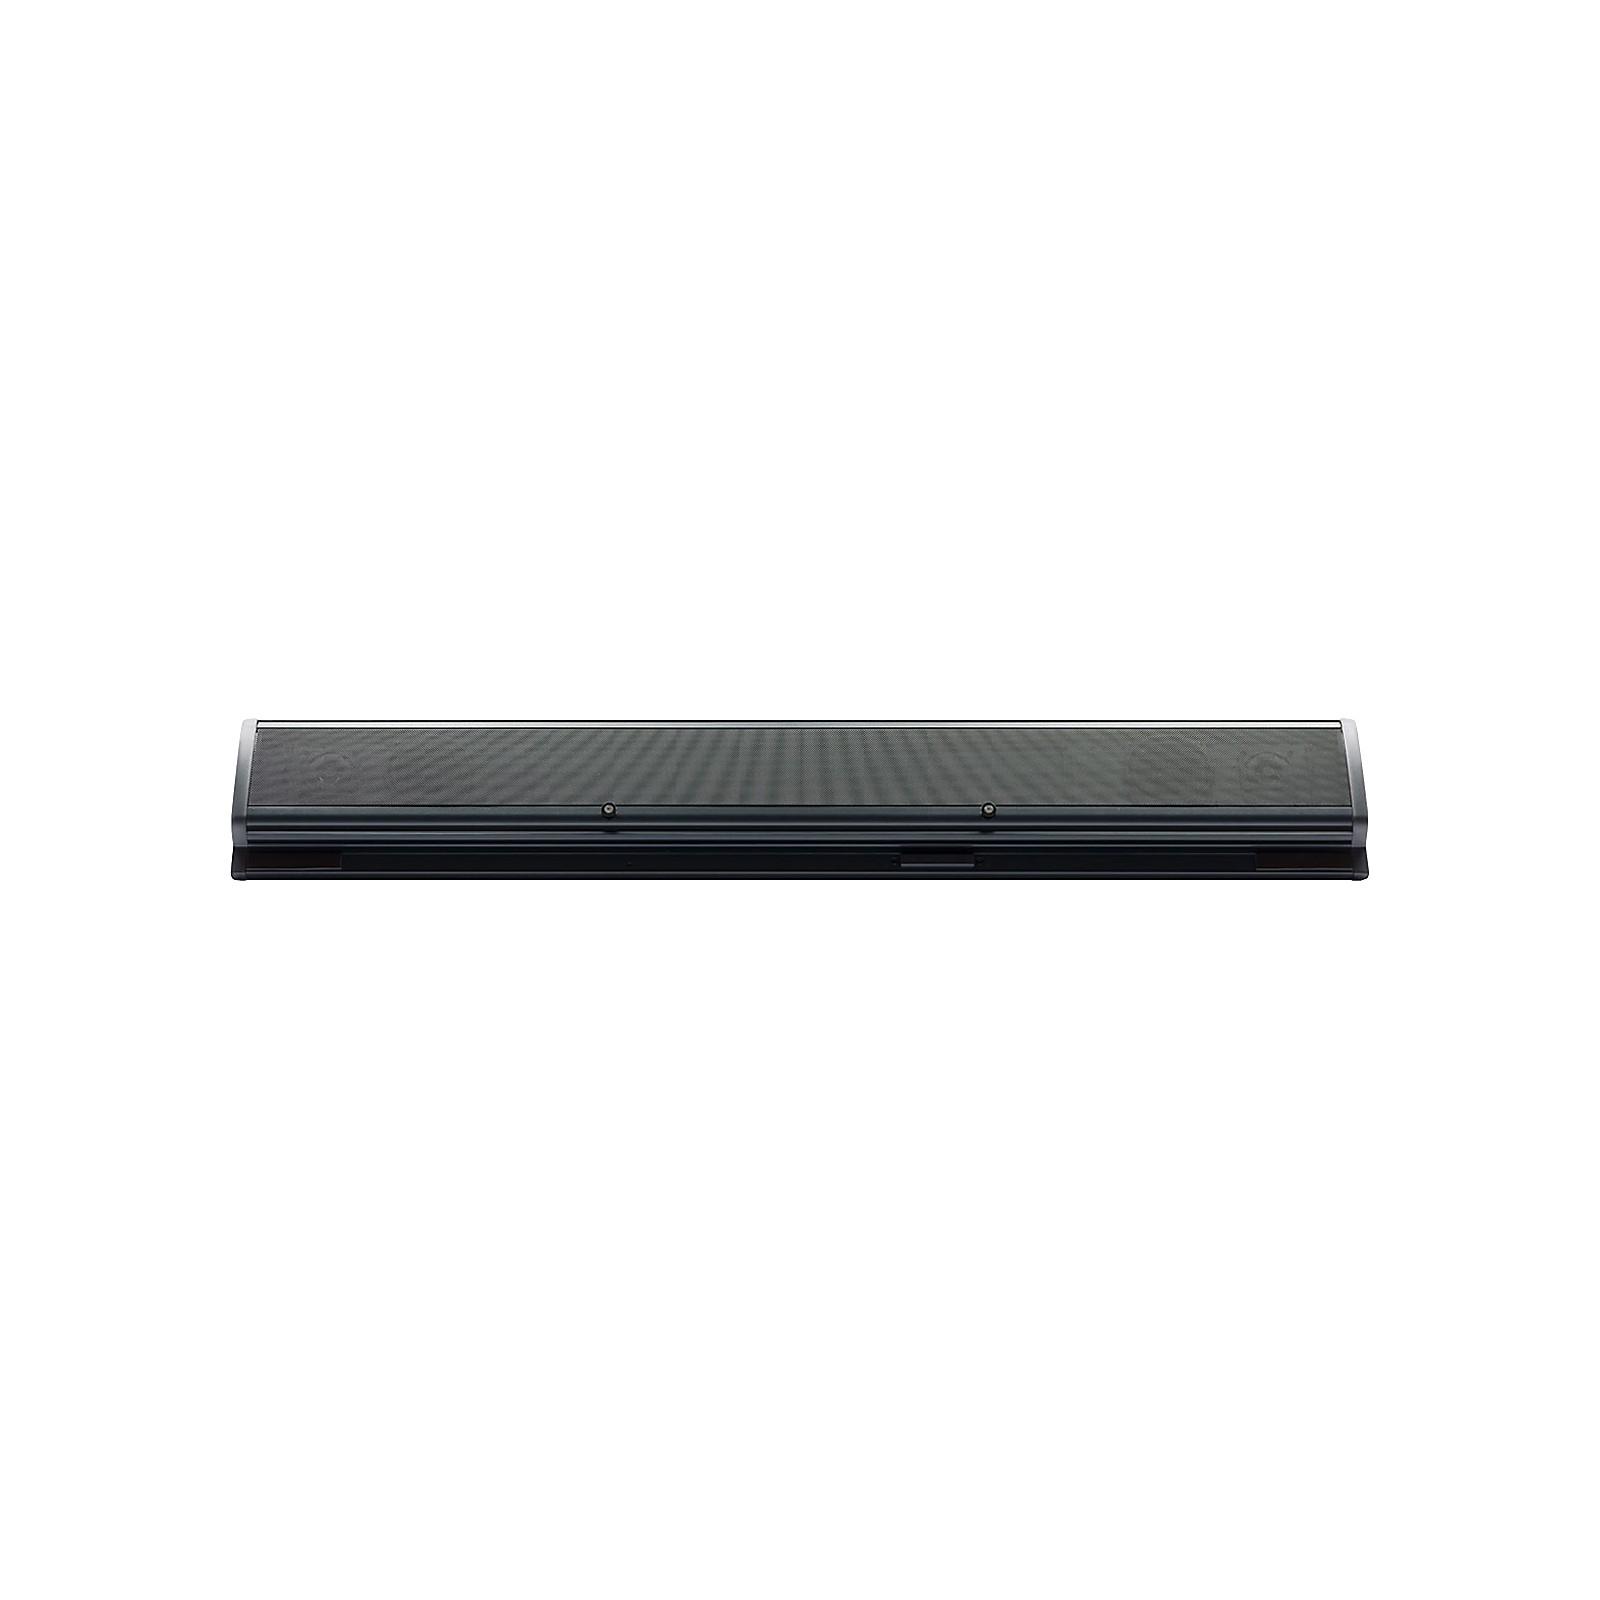 Korg PaAS Optional Speaker System for Pa Series